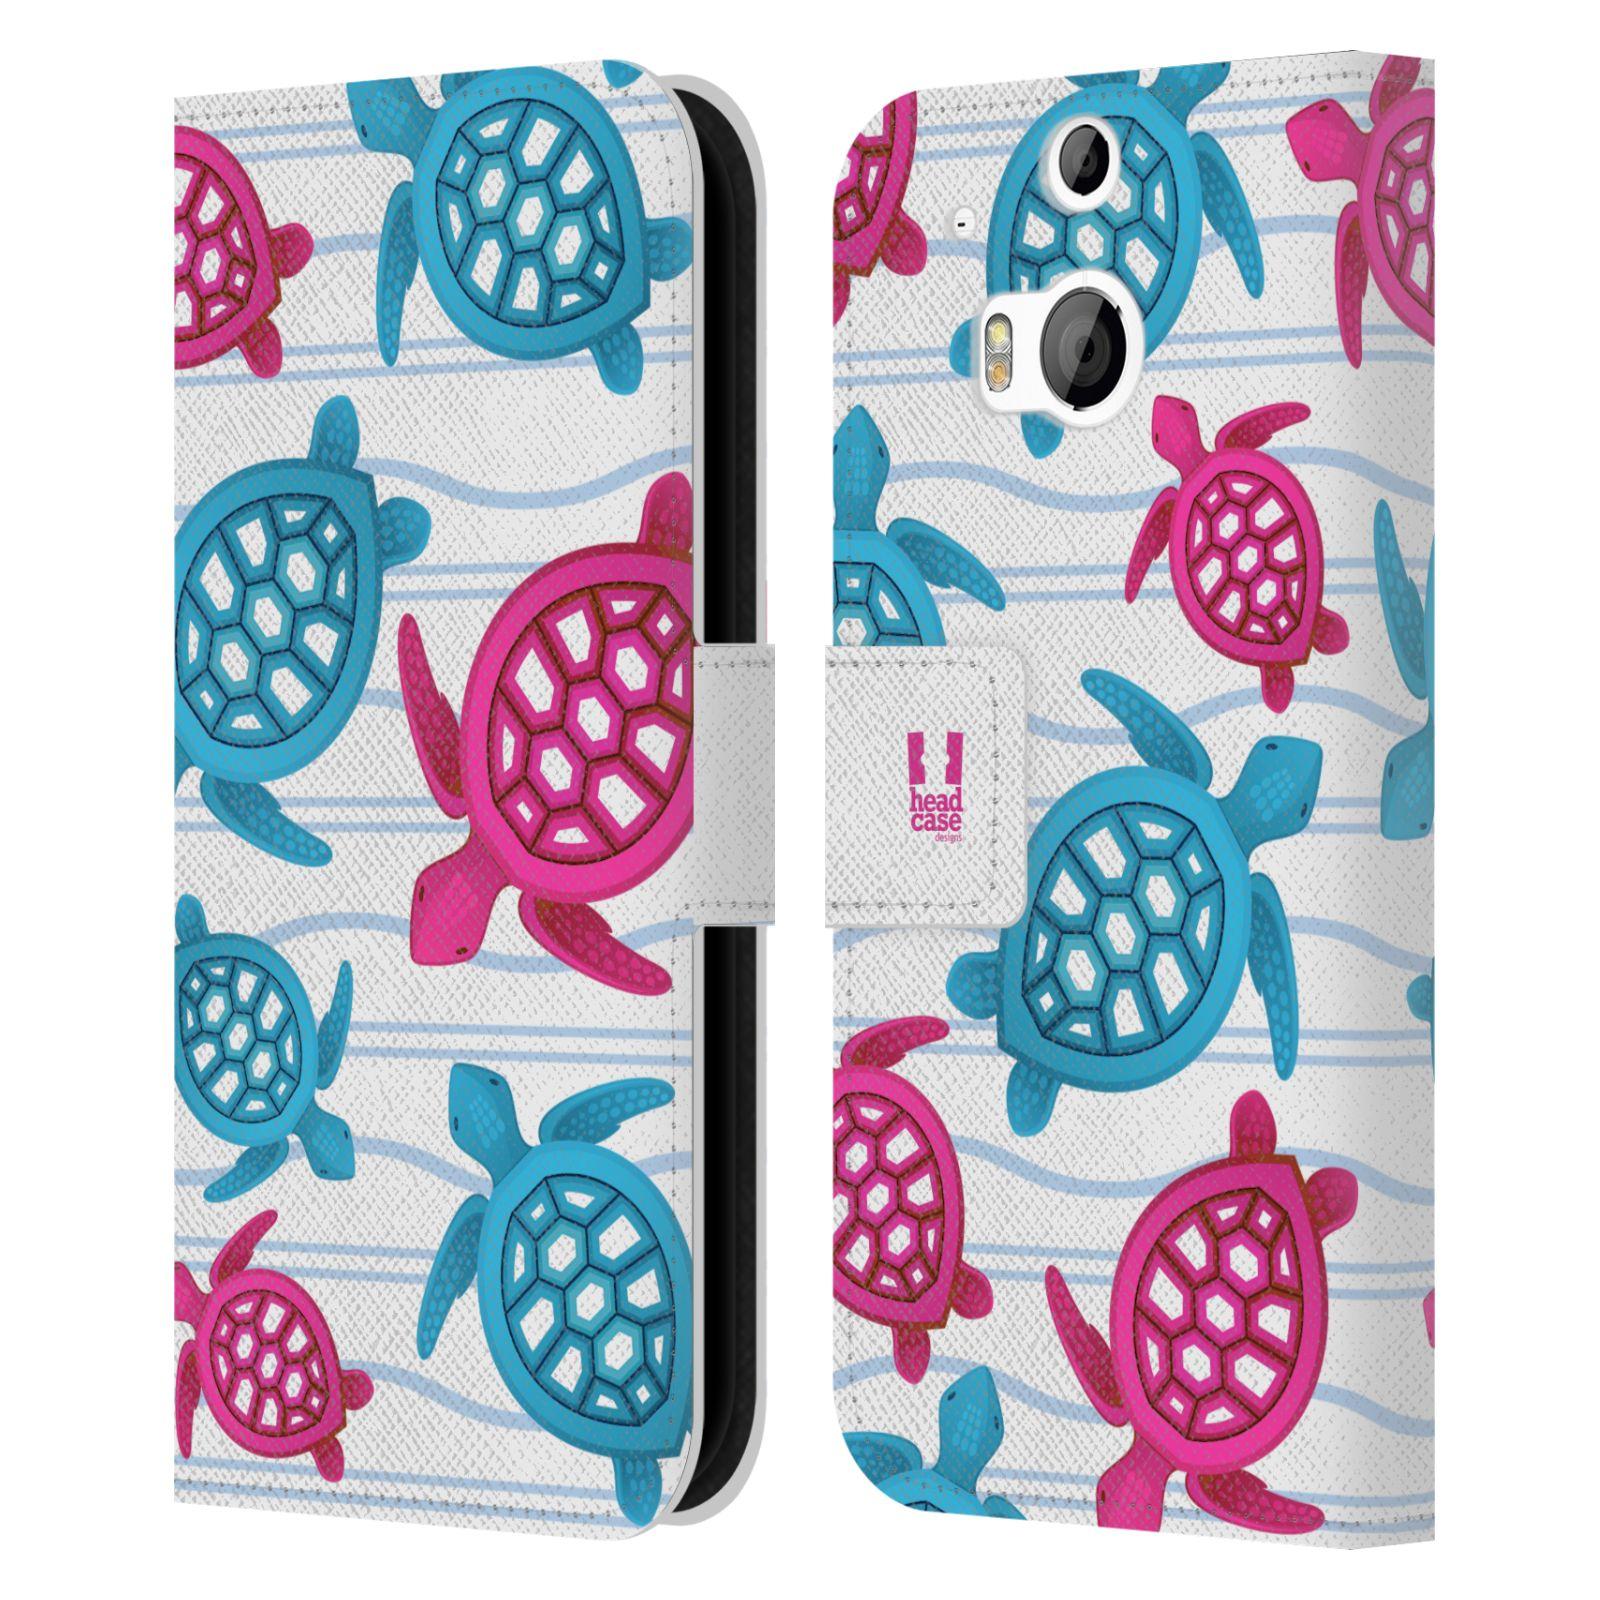 HEAD CASE Flipové pouzdro pro mobil HTC ONE (M8, M8s) Mořský živočich malé želvičky